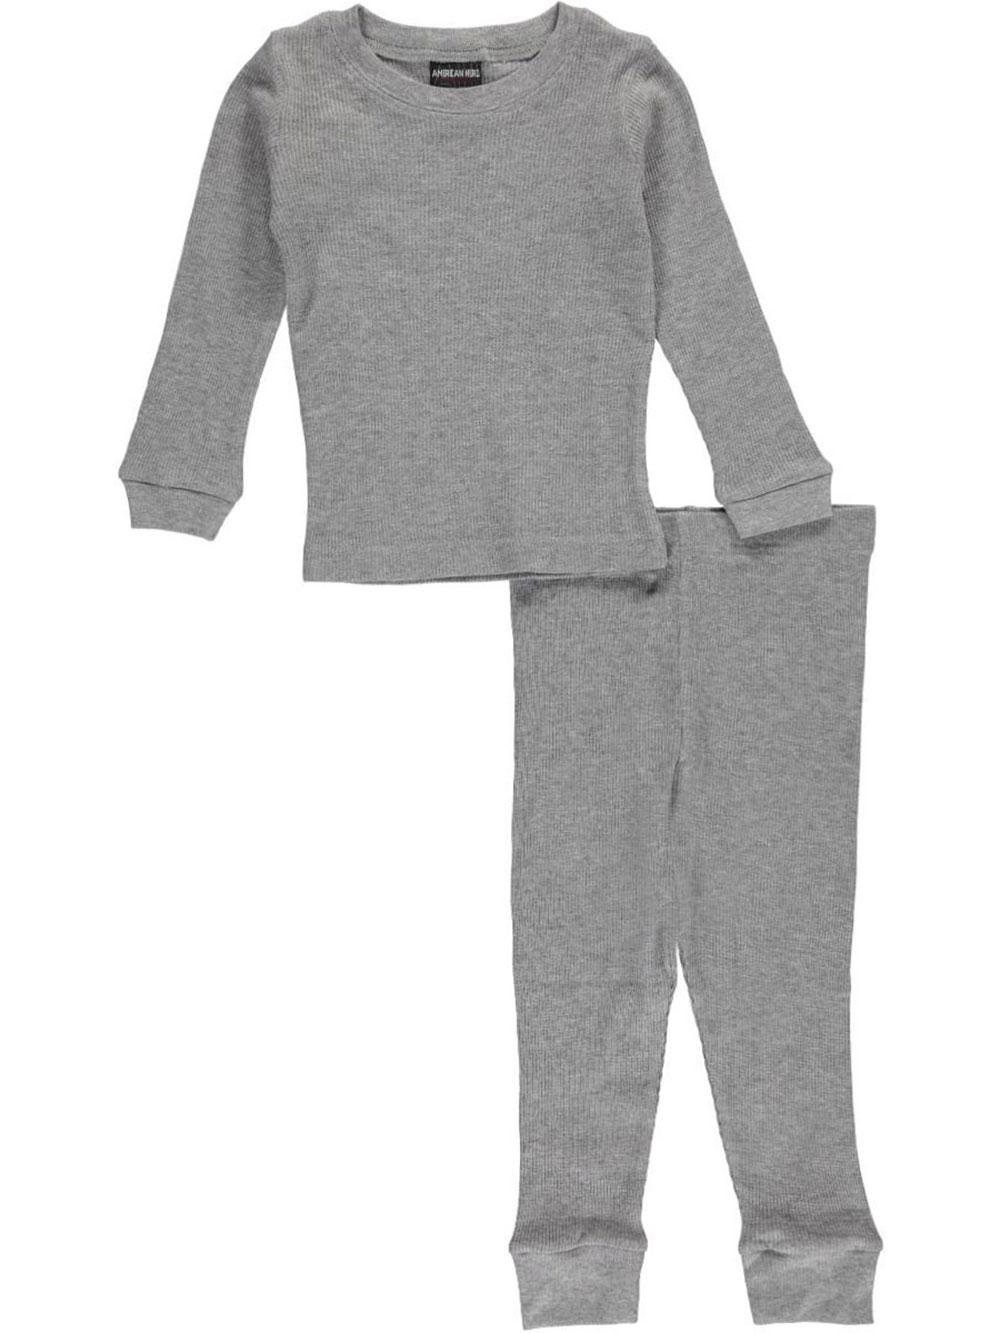 3c2aa6a91 American Hero Little Boys' 2-Piece Thermal Long Underwear (Sizes 4 ...